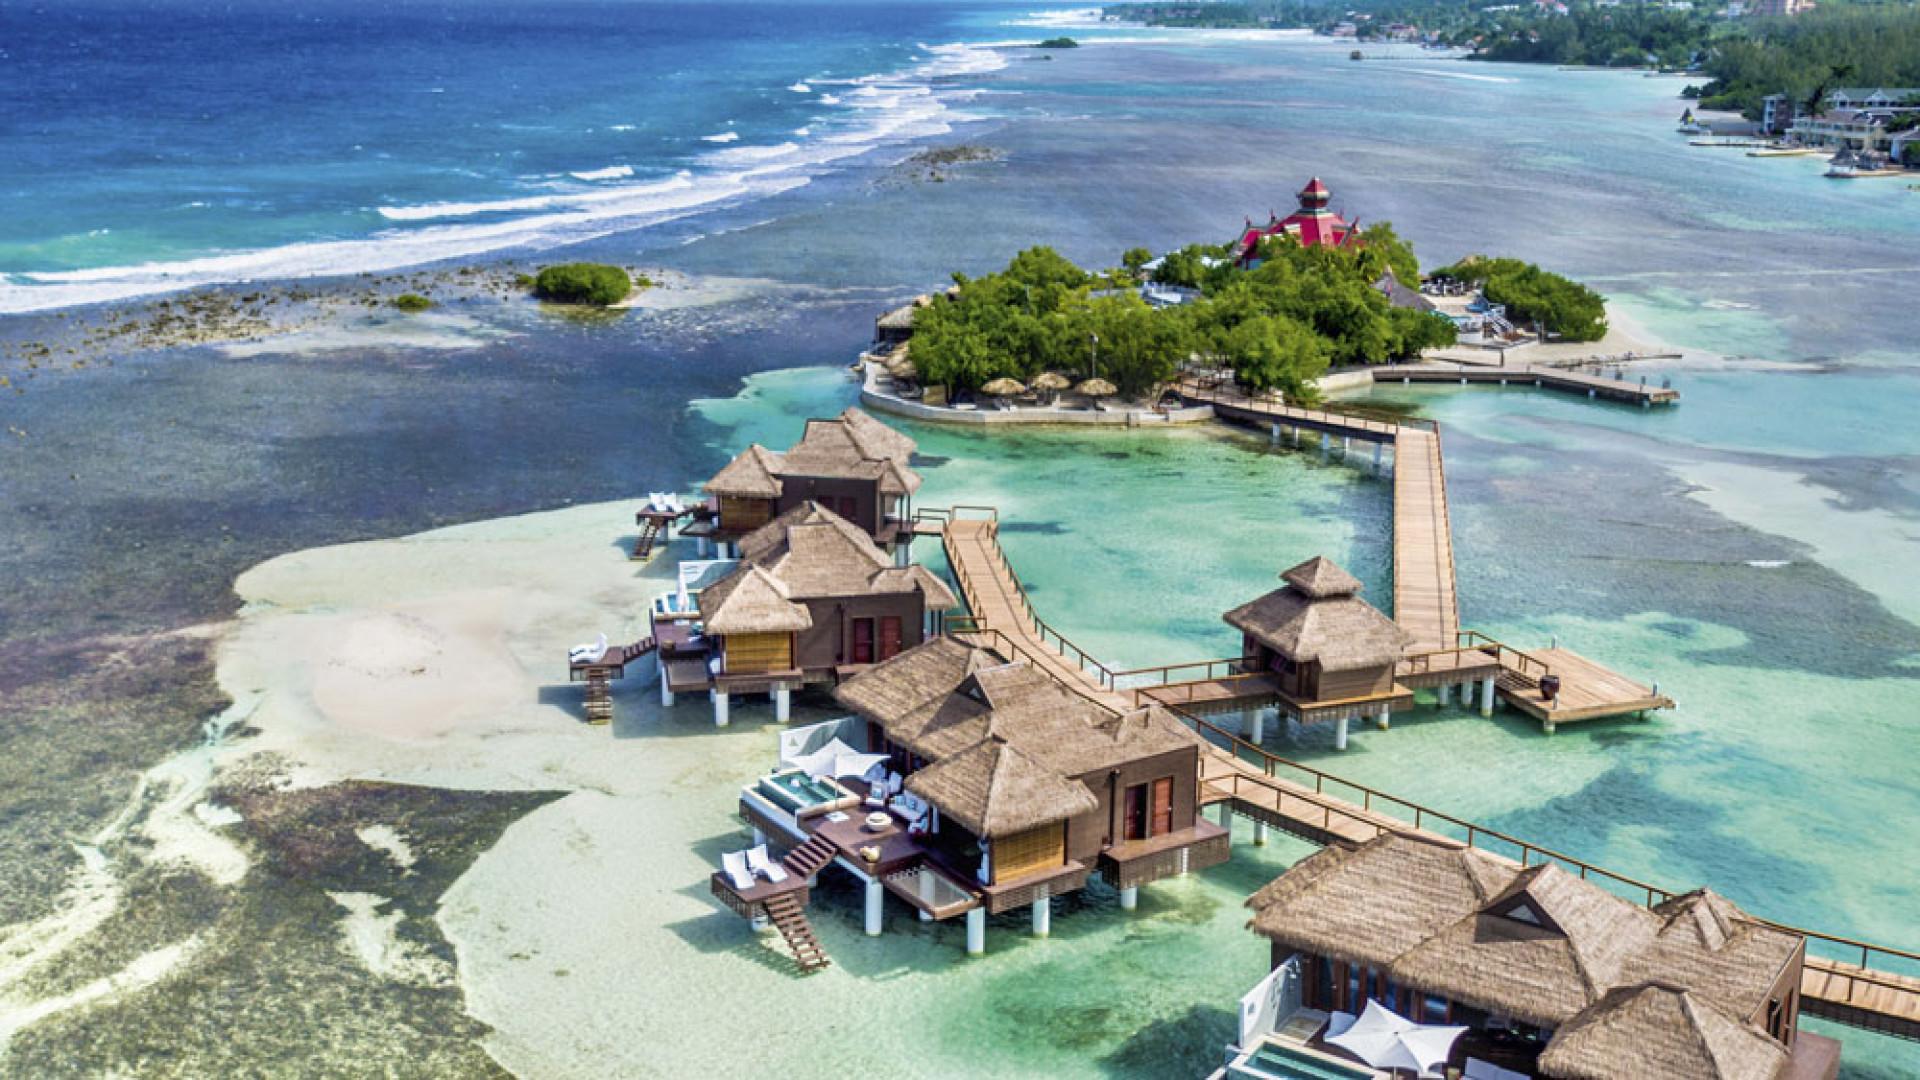 Over-water Villas at Sandals Royal Caribbean, Jamaica